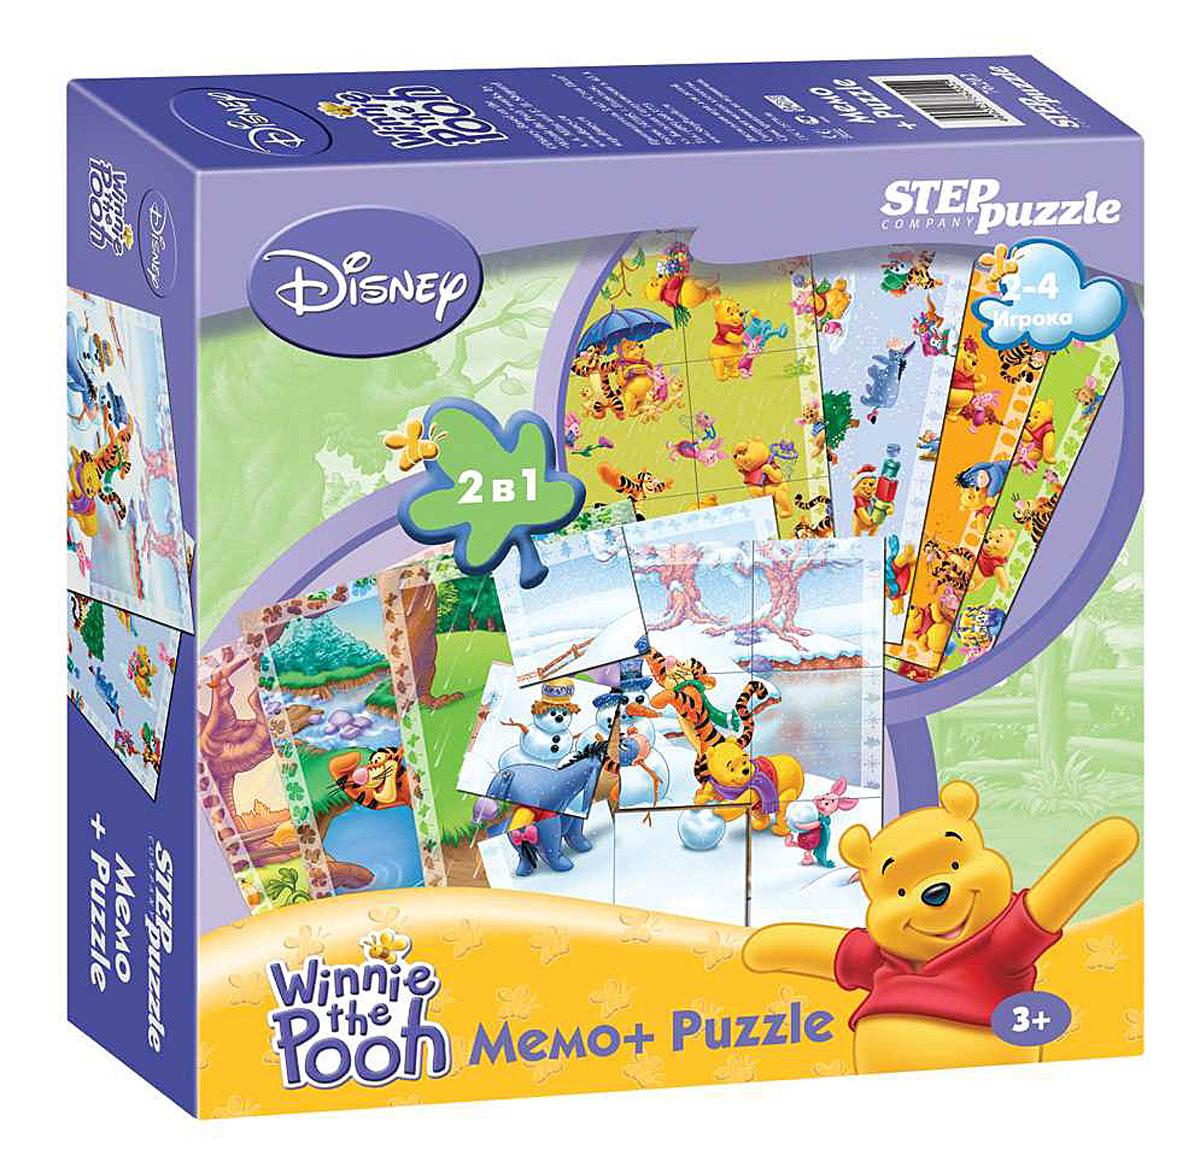 Step Puzzle Пазл для малышей Медвежонок Винни 2 в 1 пазл step puzzle 160эл медвежонок винни